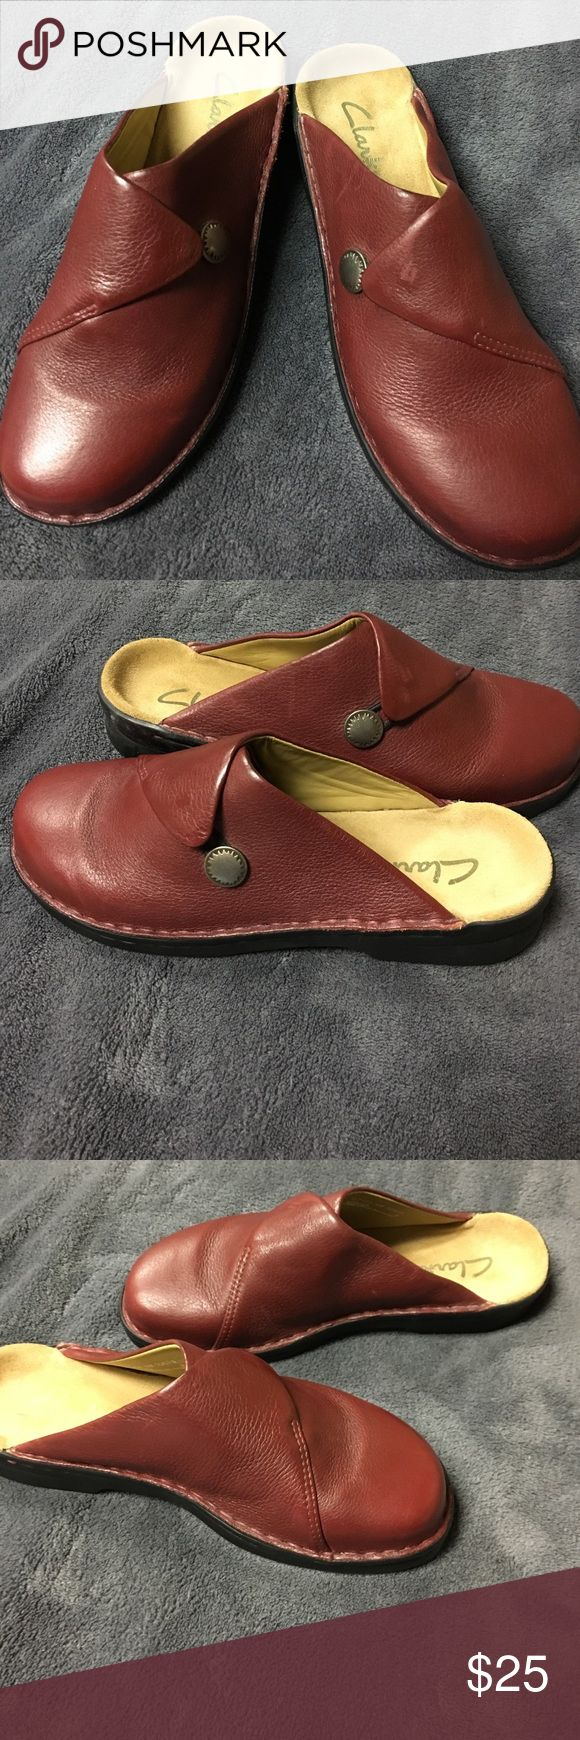 Clark's shoes Clark's slip on shoes reddish color  never worn Clarks Shoes